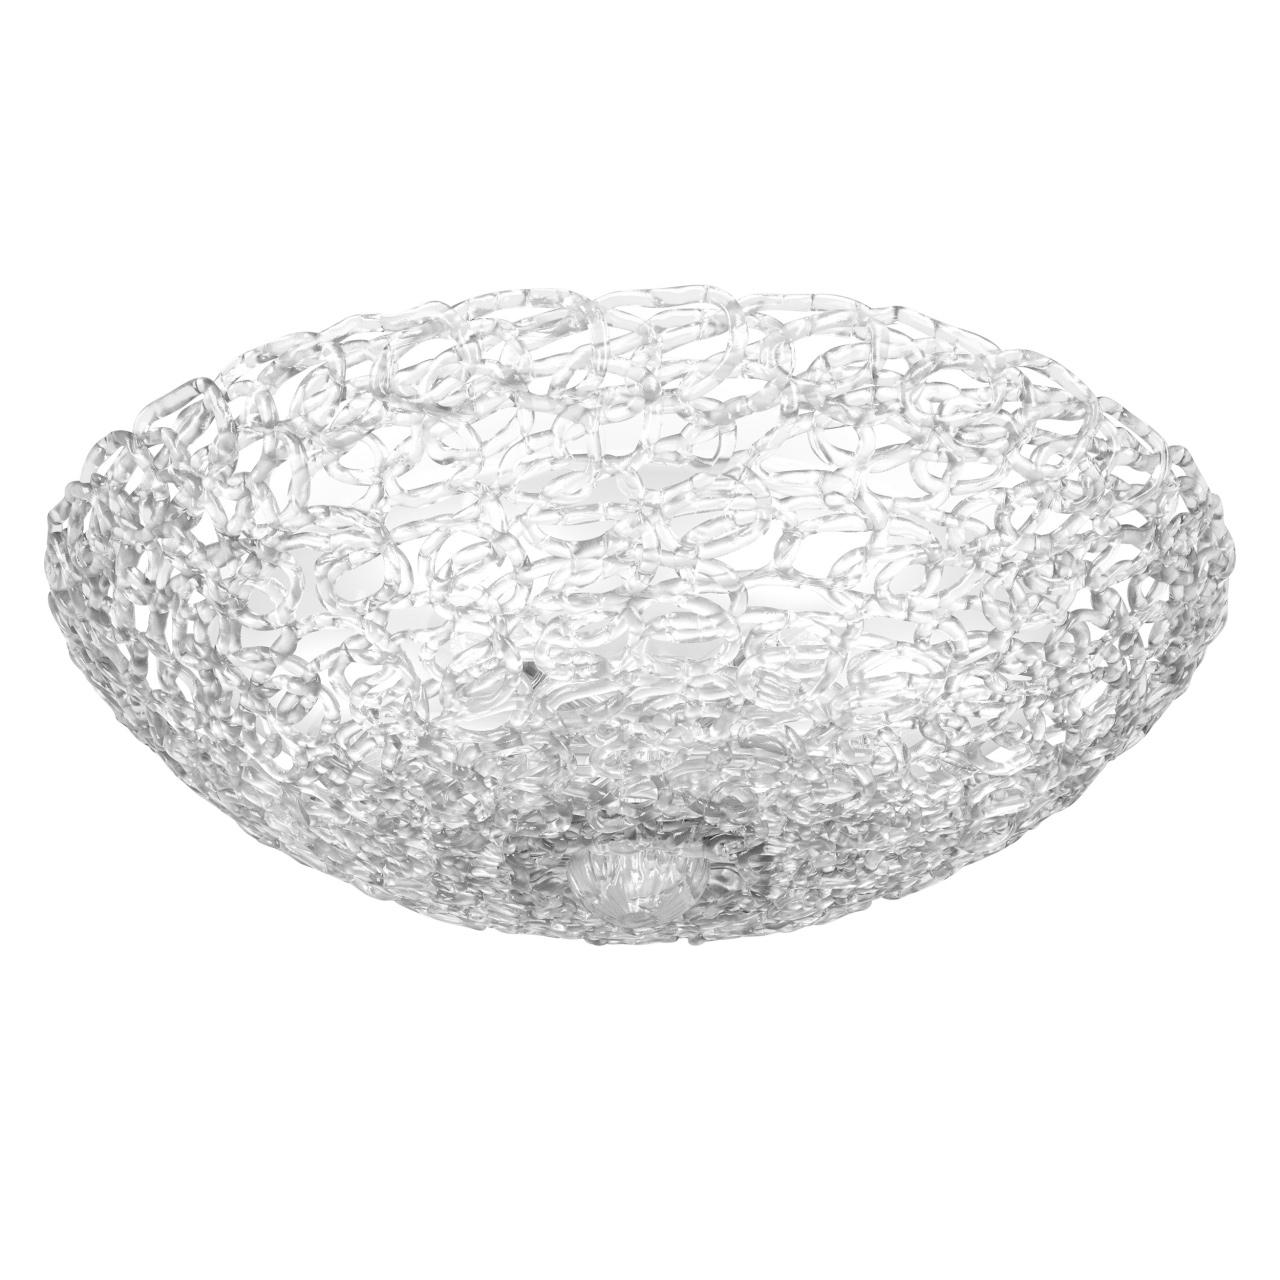 Люстра потолочная Lightstar 603070 Murano